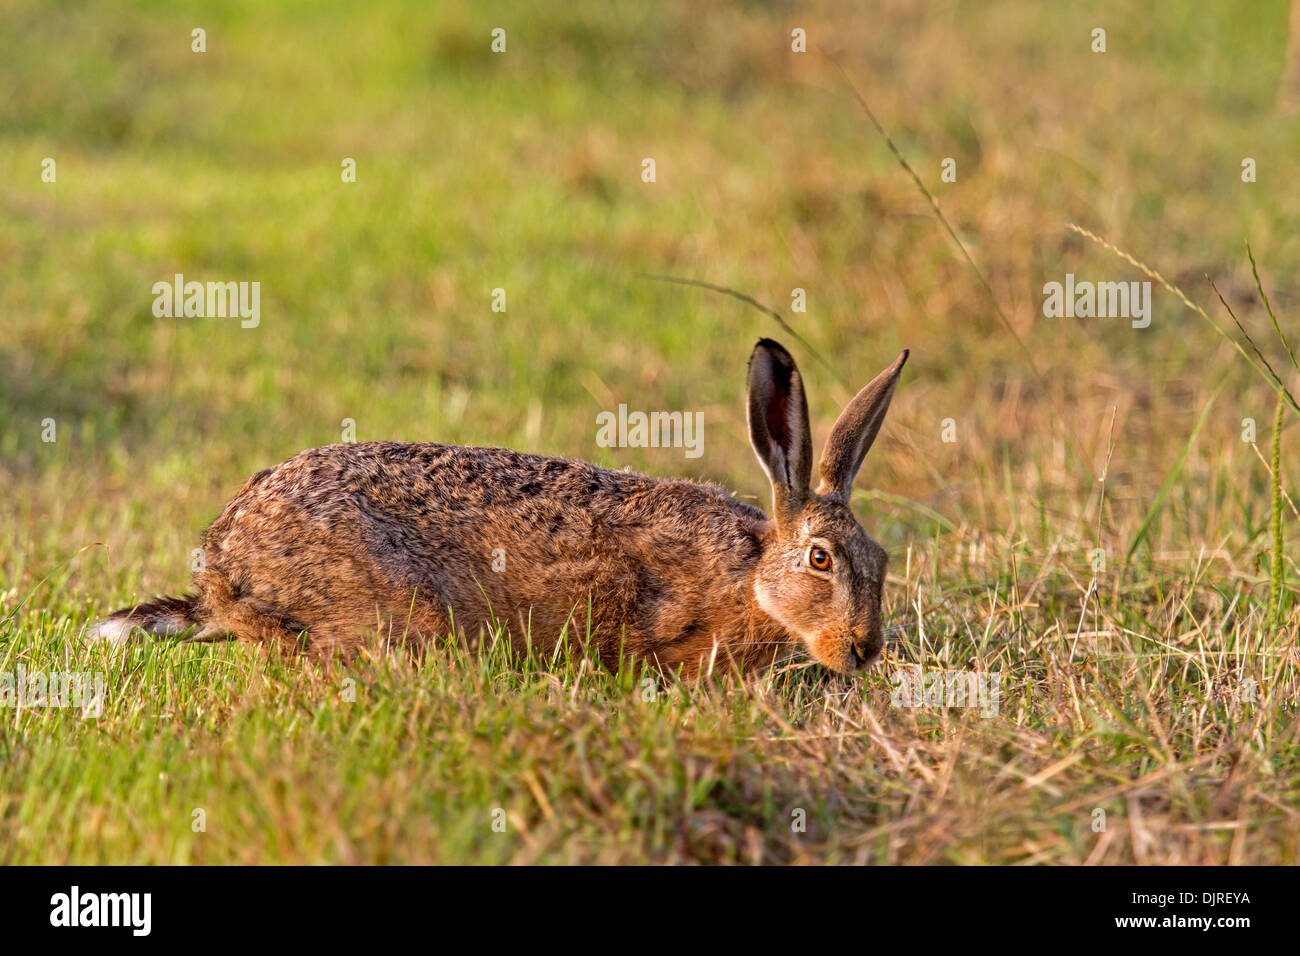 European Hare (Lepus europaeus) - Stock Image